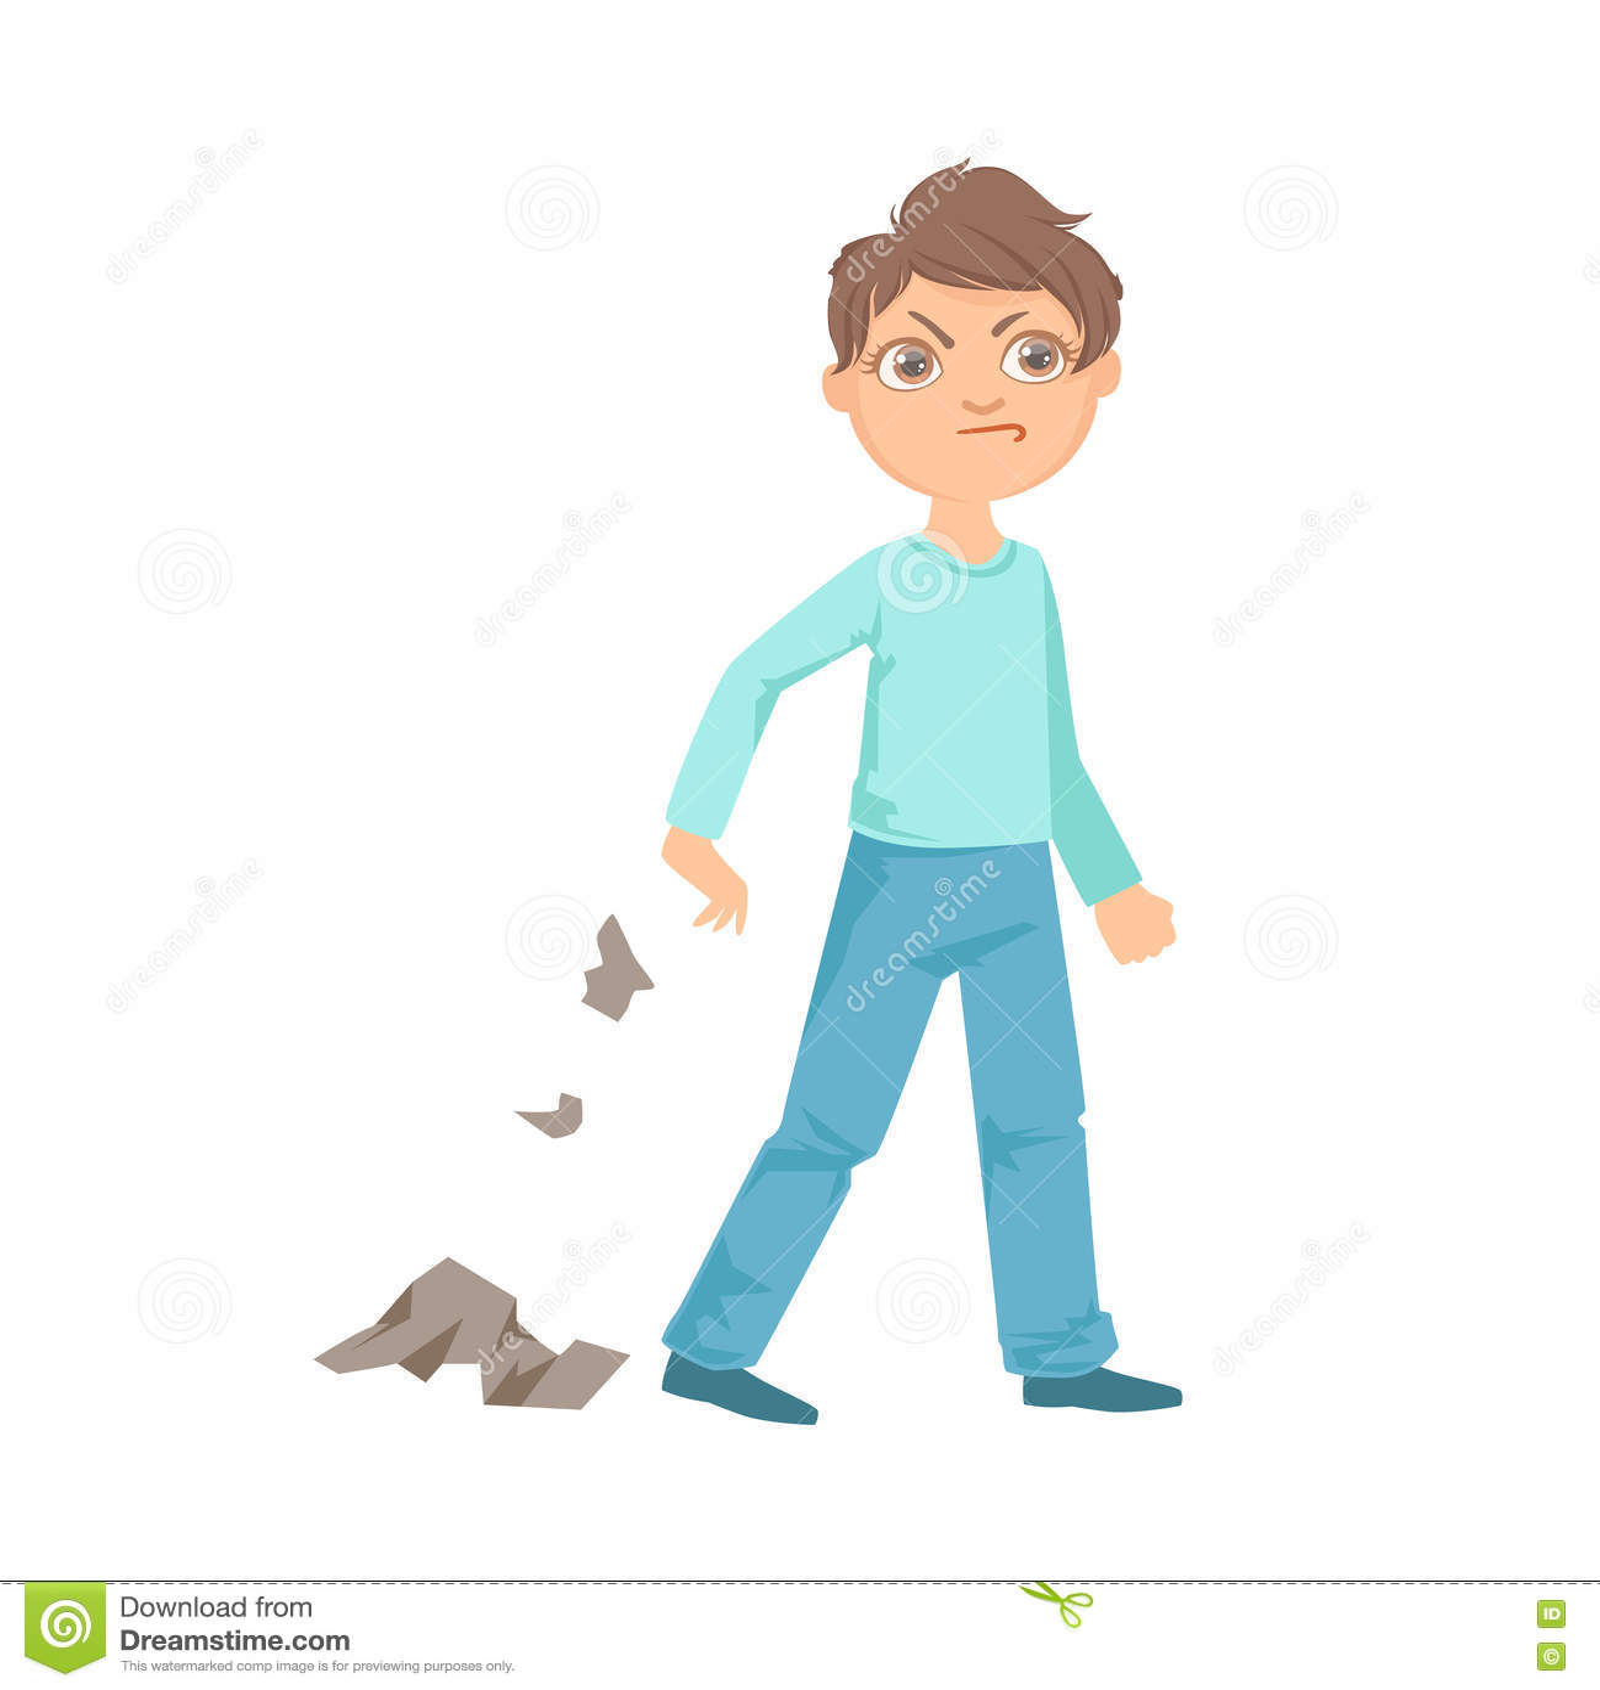 Boy Littering Teenage Bully Demonstrating Mischievous Uncontrollable Delinquent Behavior Cartoon Illustration